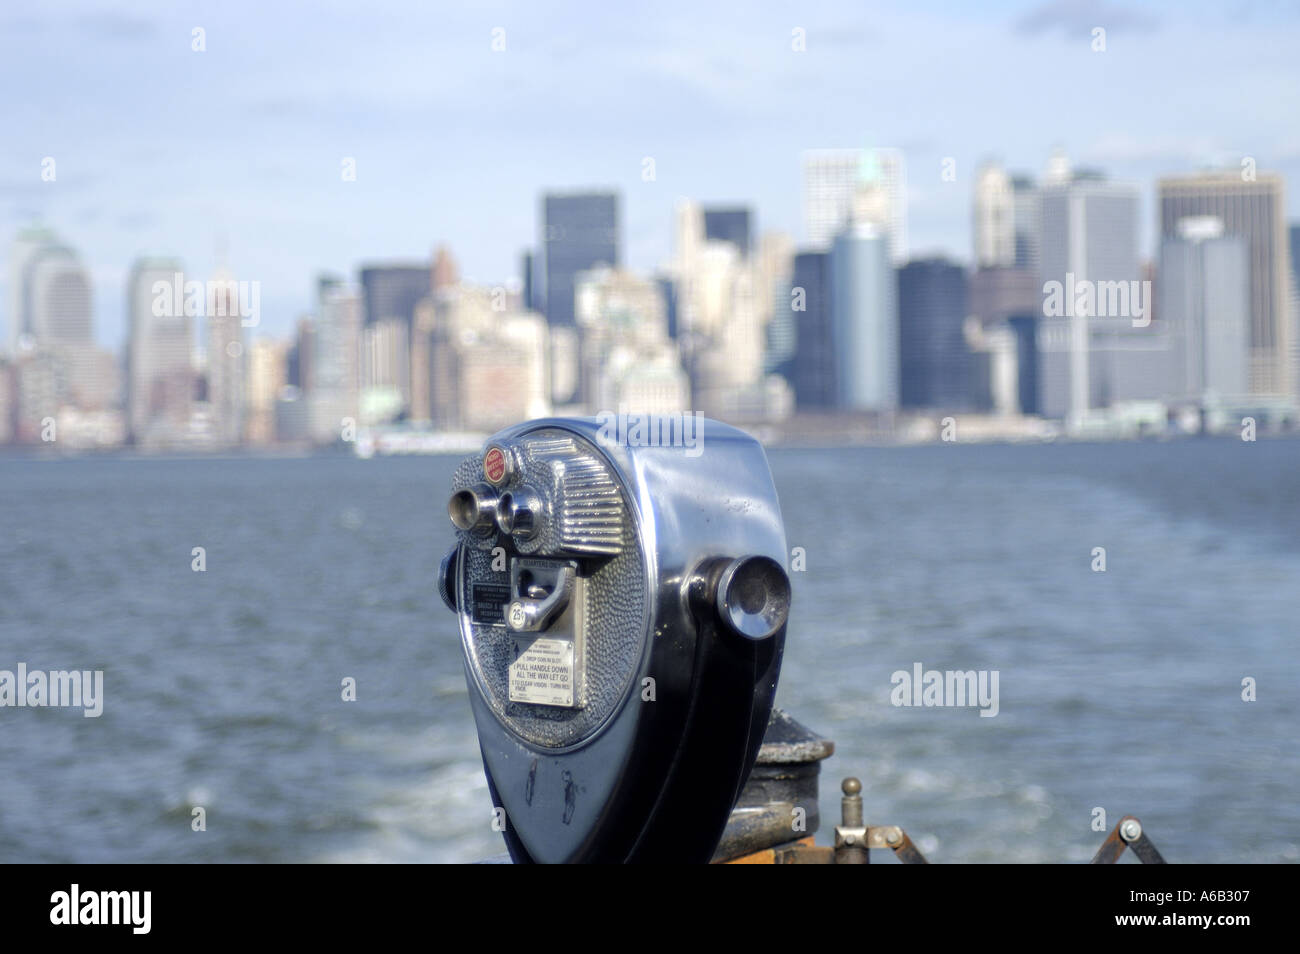 Binoculars overlooking New York City skyline from across the East River. Stock Photo